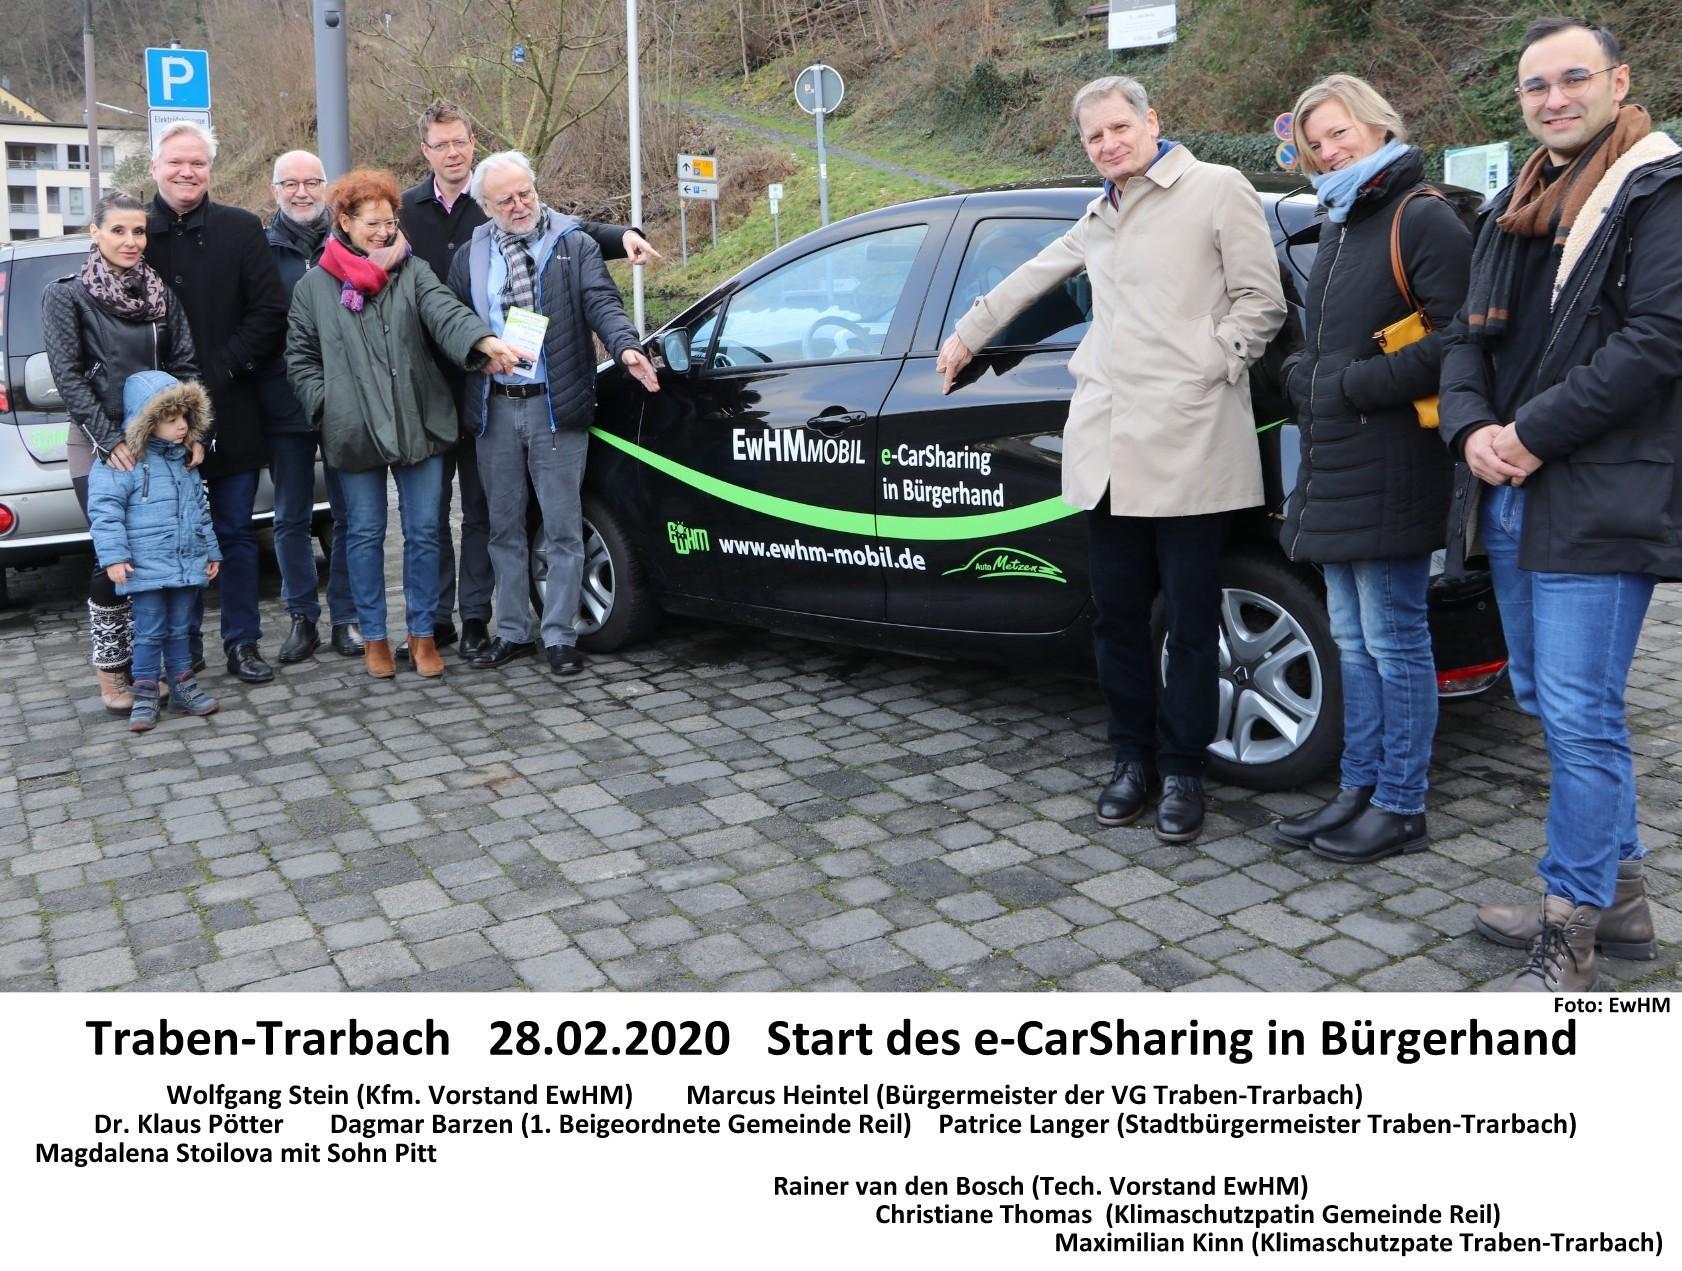 Start des e-CarSharing in Traben-Trarbach